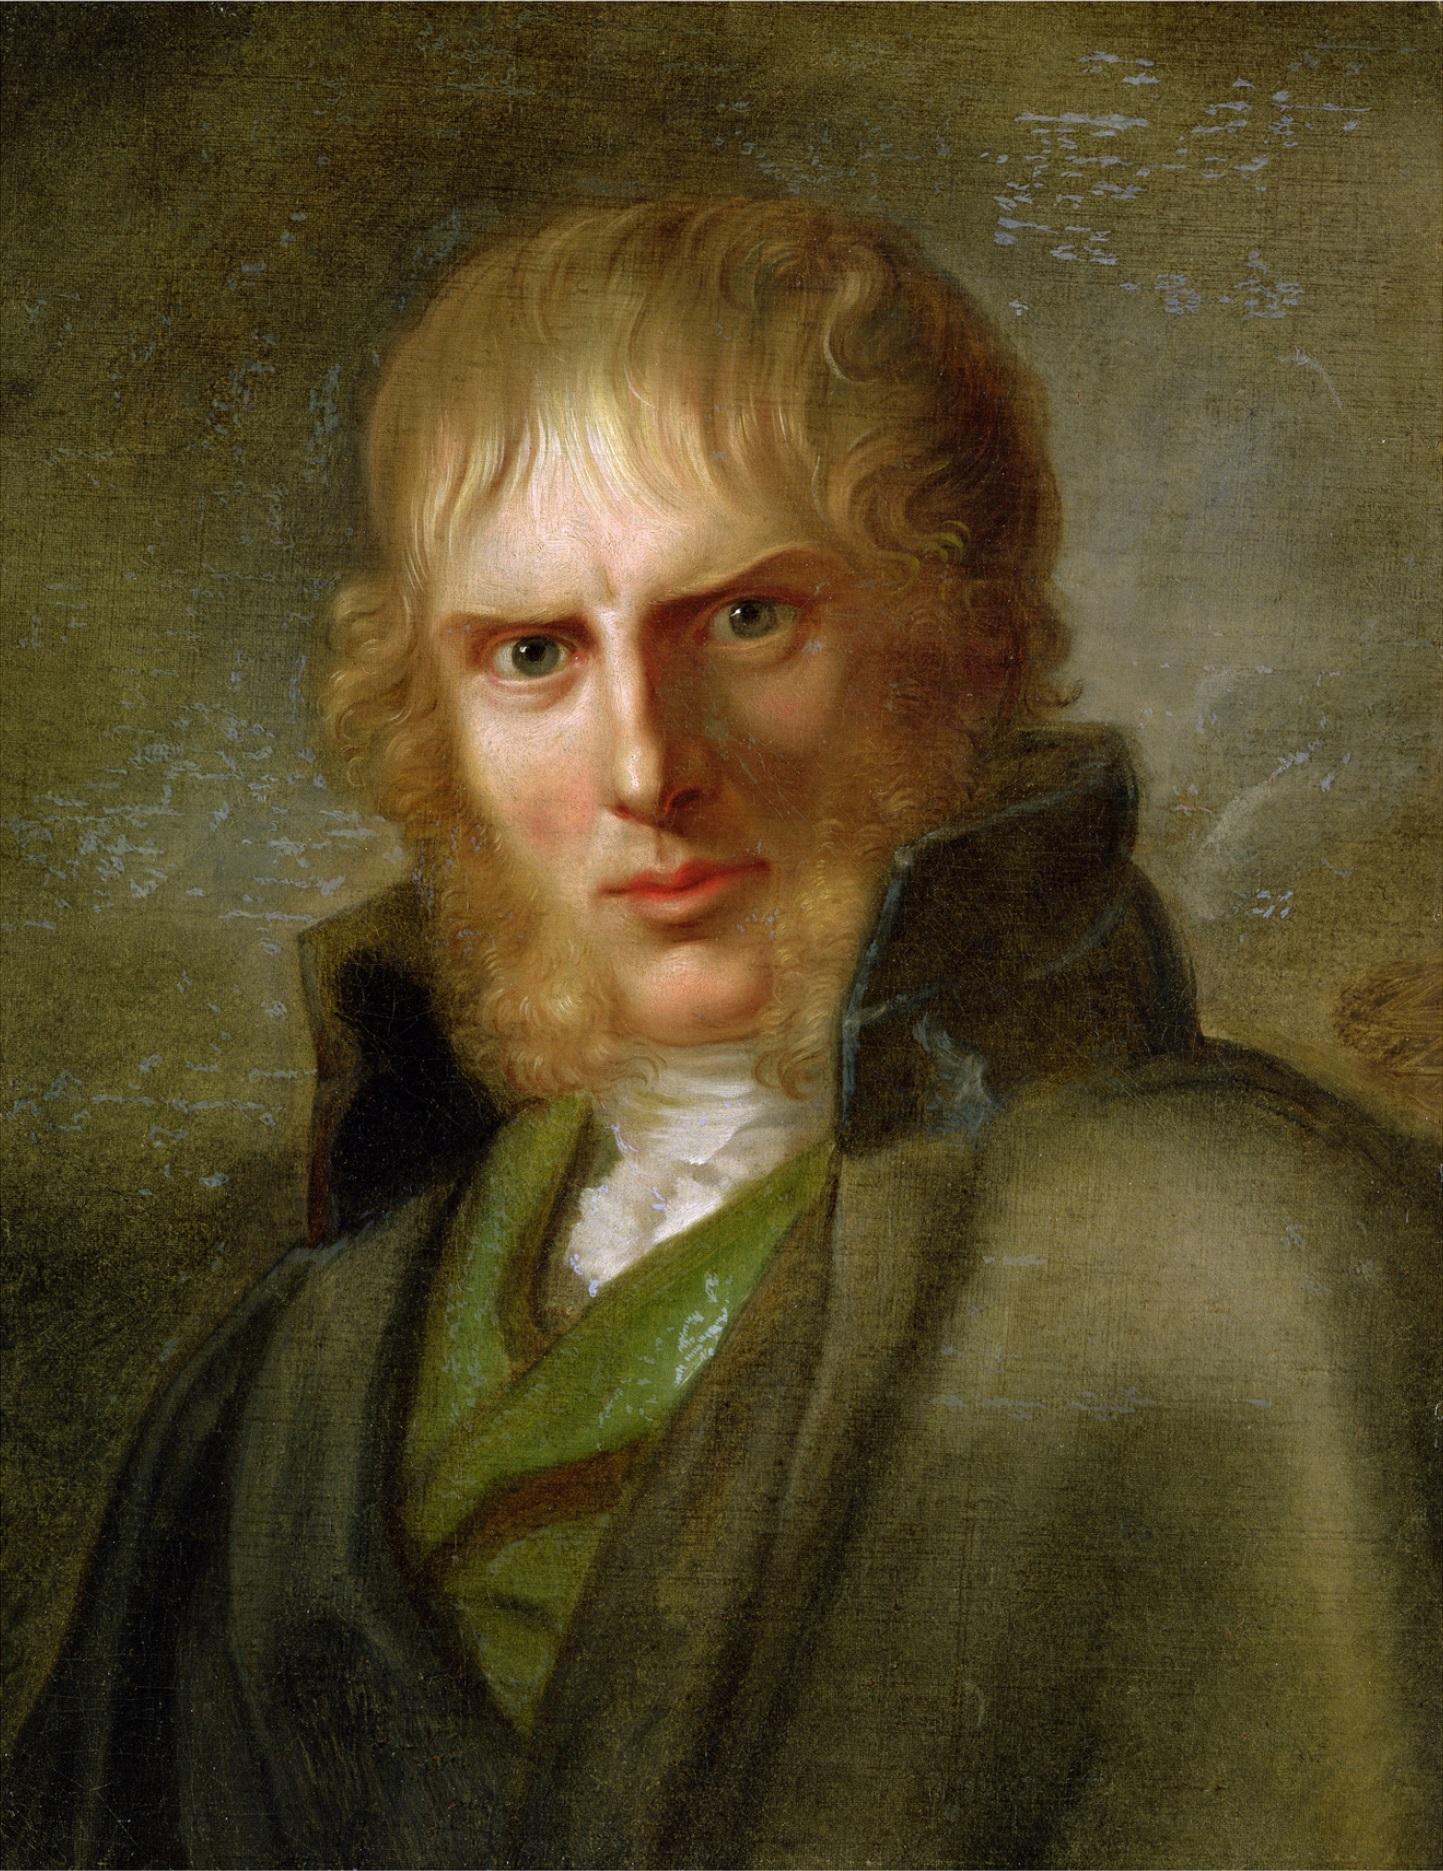 https://i0.wp.com/upload.wikimedia.org/wikipedia/commons/a/ac/Gerhard_von_K%C3%BCgelgen_portrait_of_Friedrich.jpg